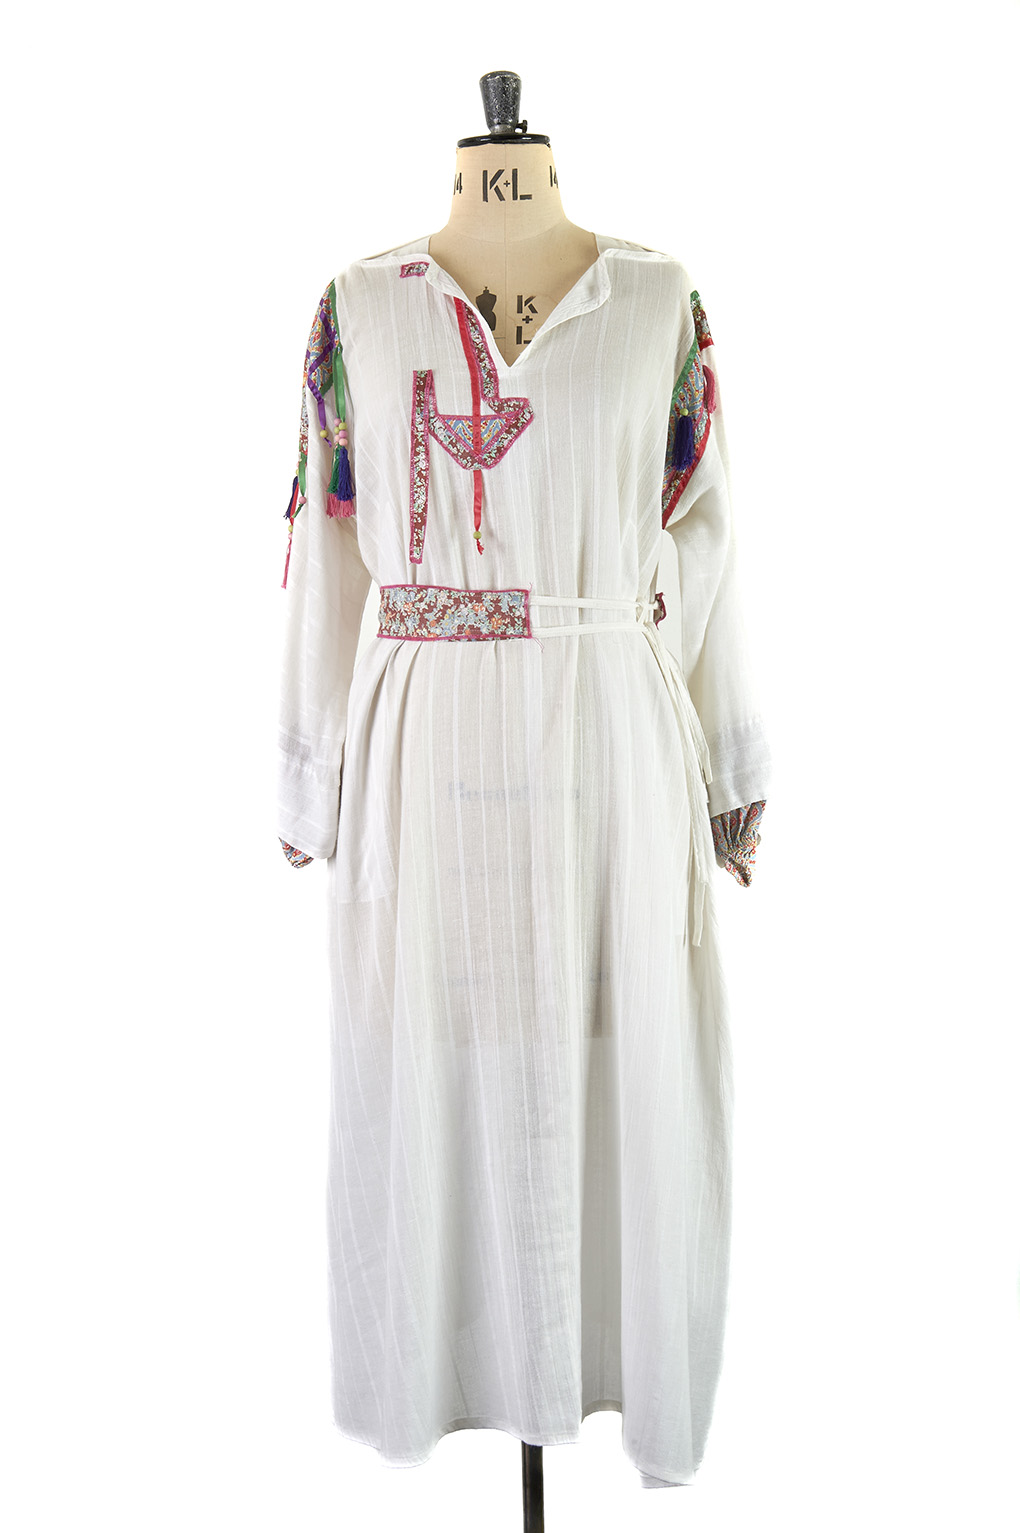 White Kaftan Dress by Jeff Banks for Rembrandt